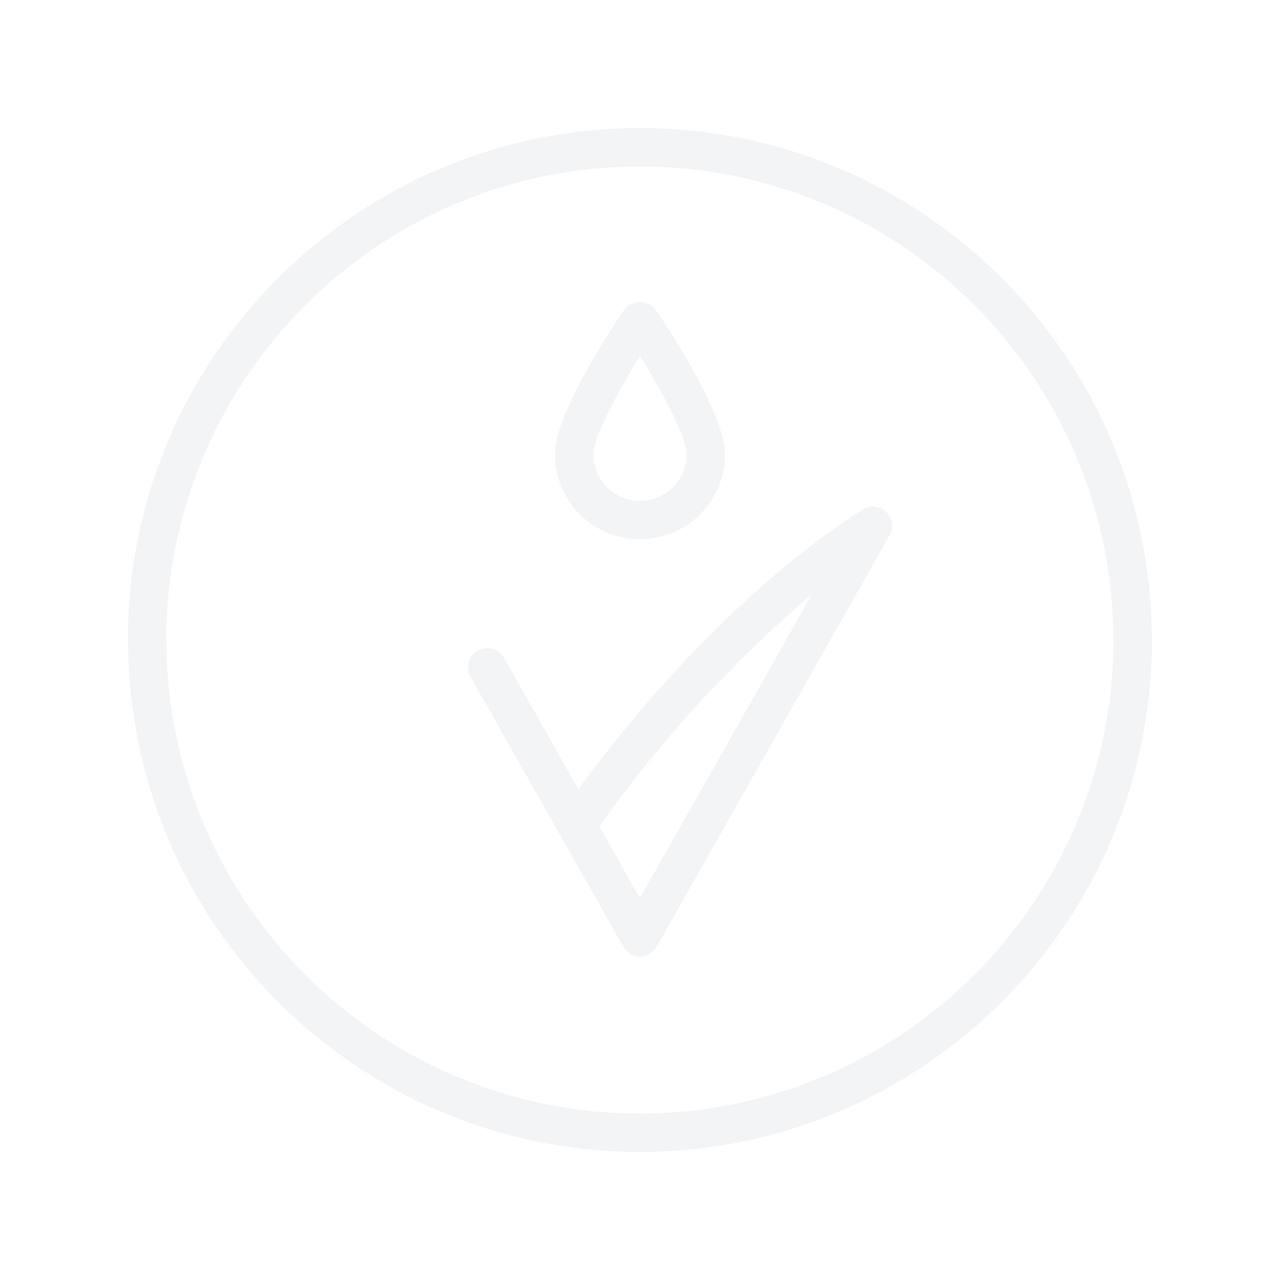 Calvin Klein Eternity Men EDT 50ml